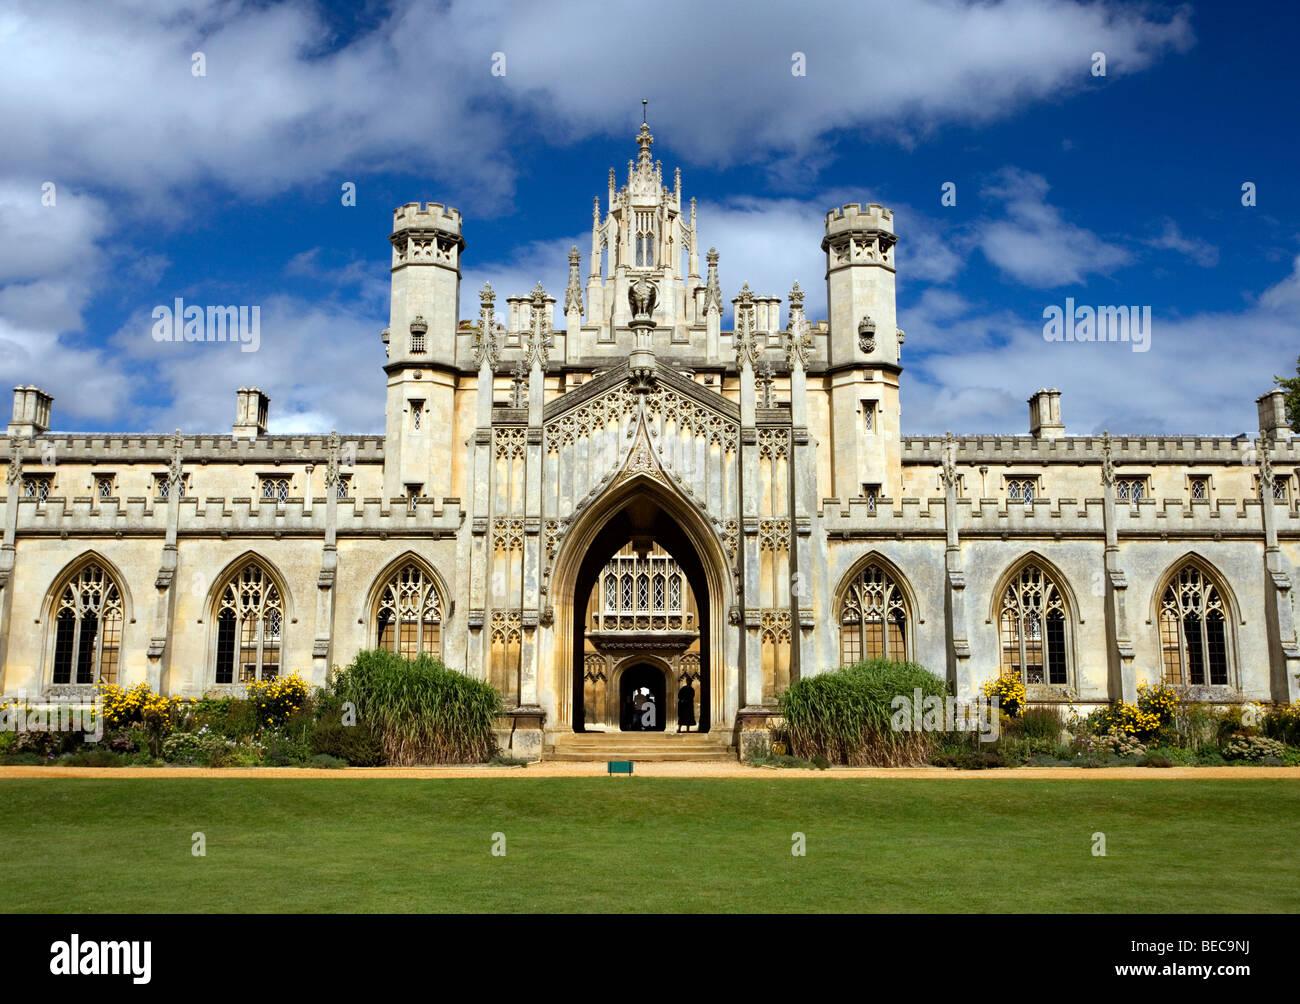 St. John's College in Cambridge, Cambridgeshire, UK. - Stock Image